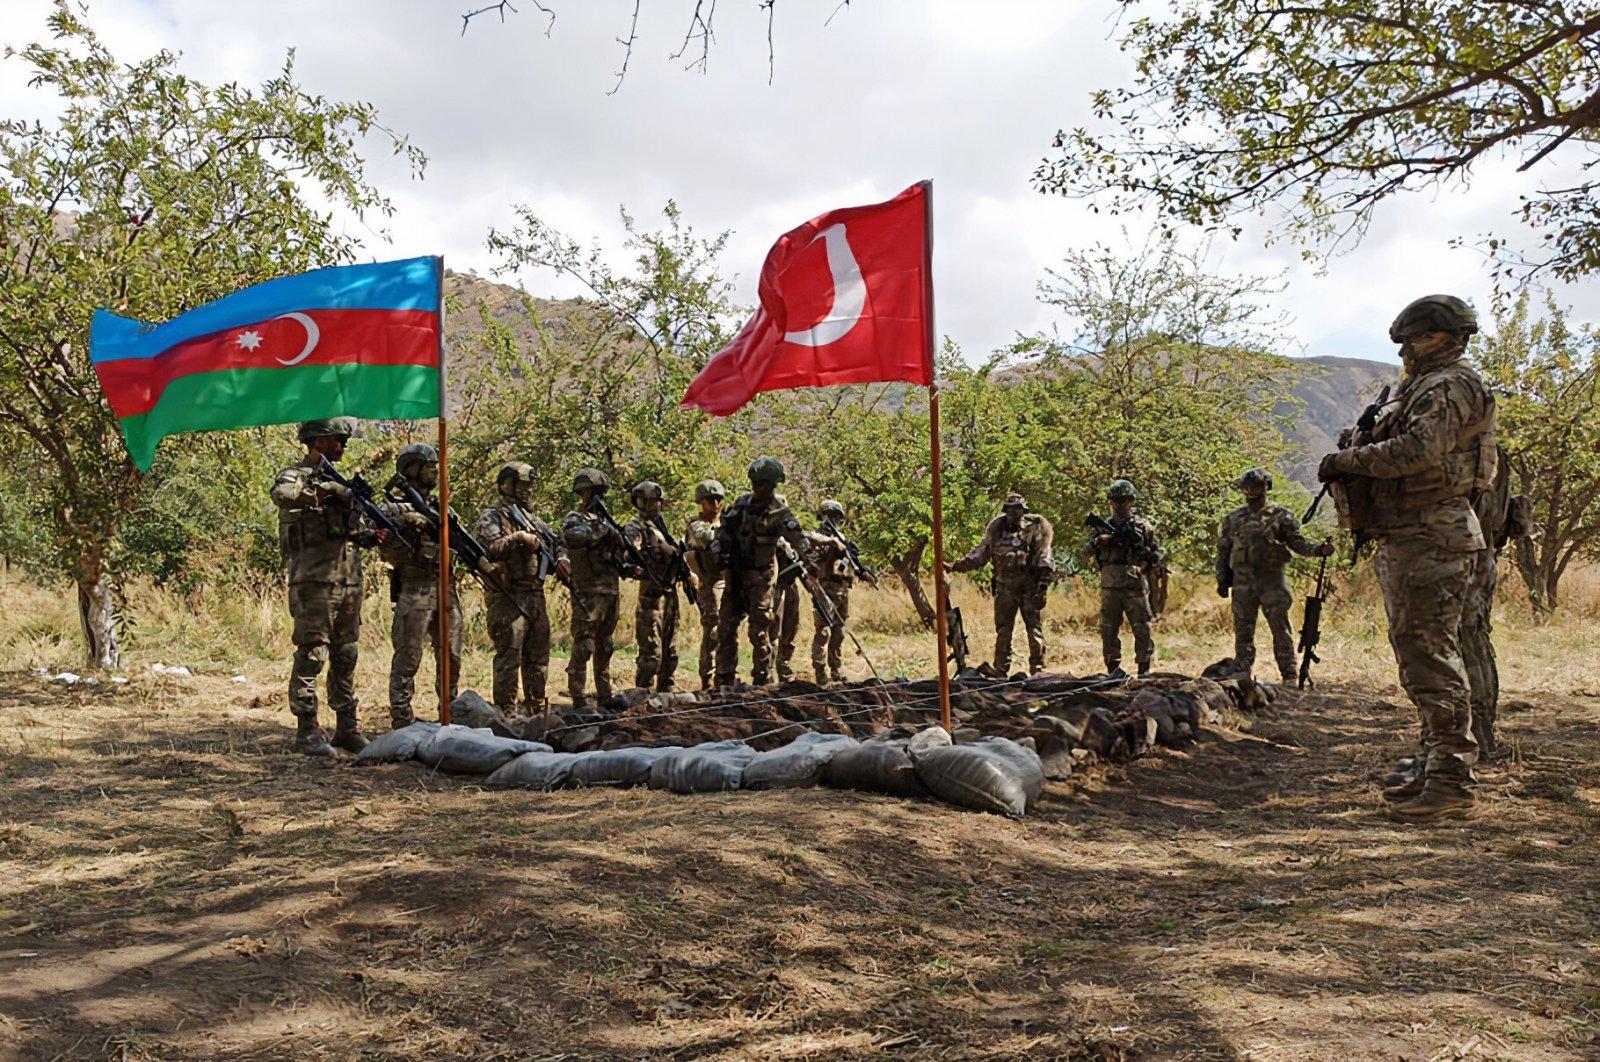 Turkish and Azerbaijani militaries participate in joint military exercises in Lachin, Azerbaijan, Sept. 7, 2021. (AA Photo)